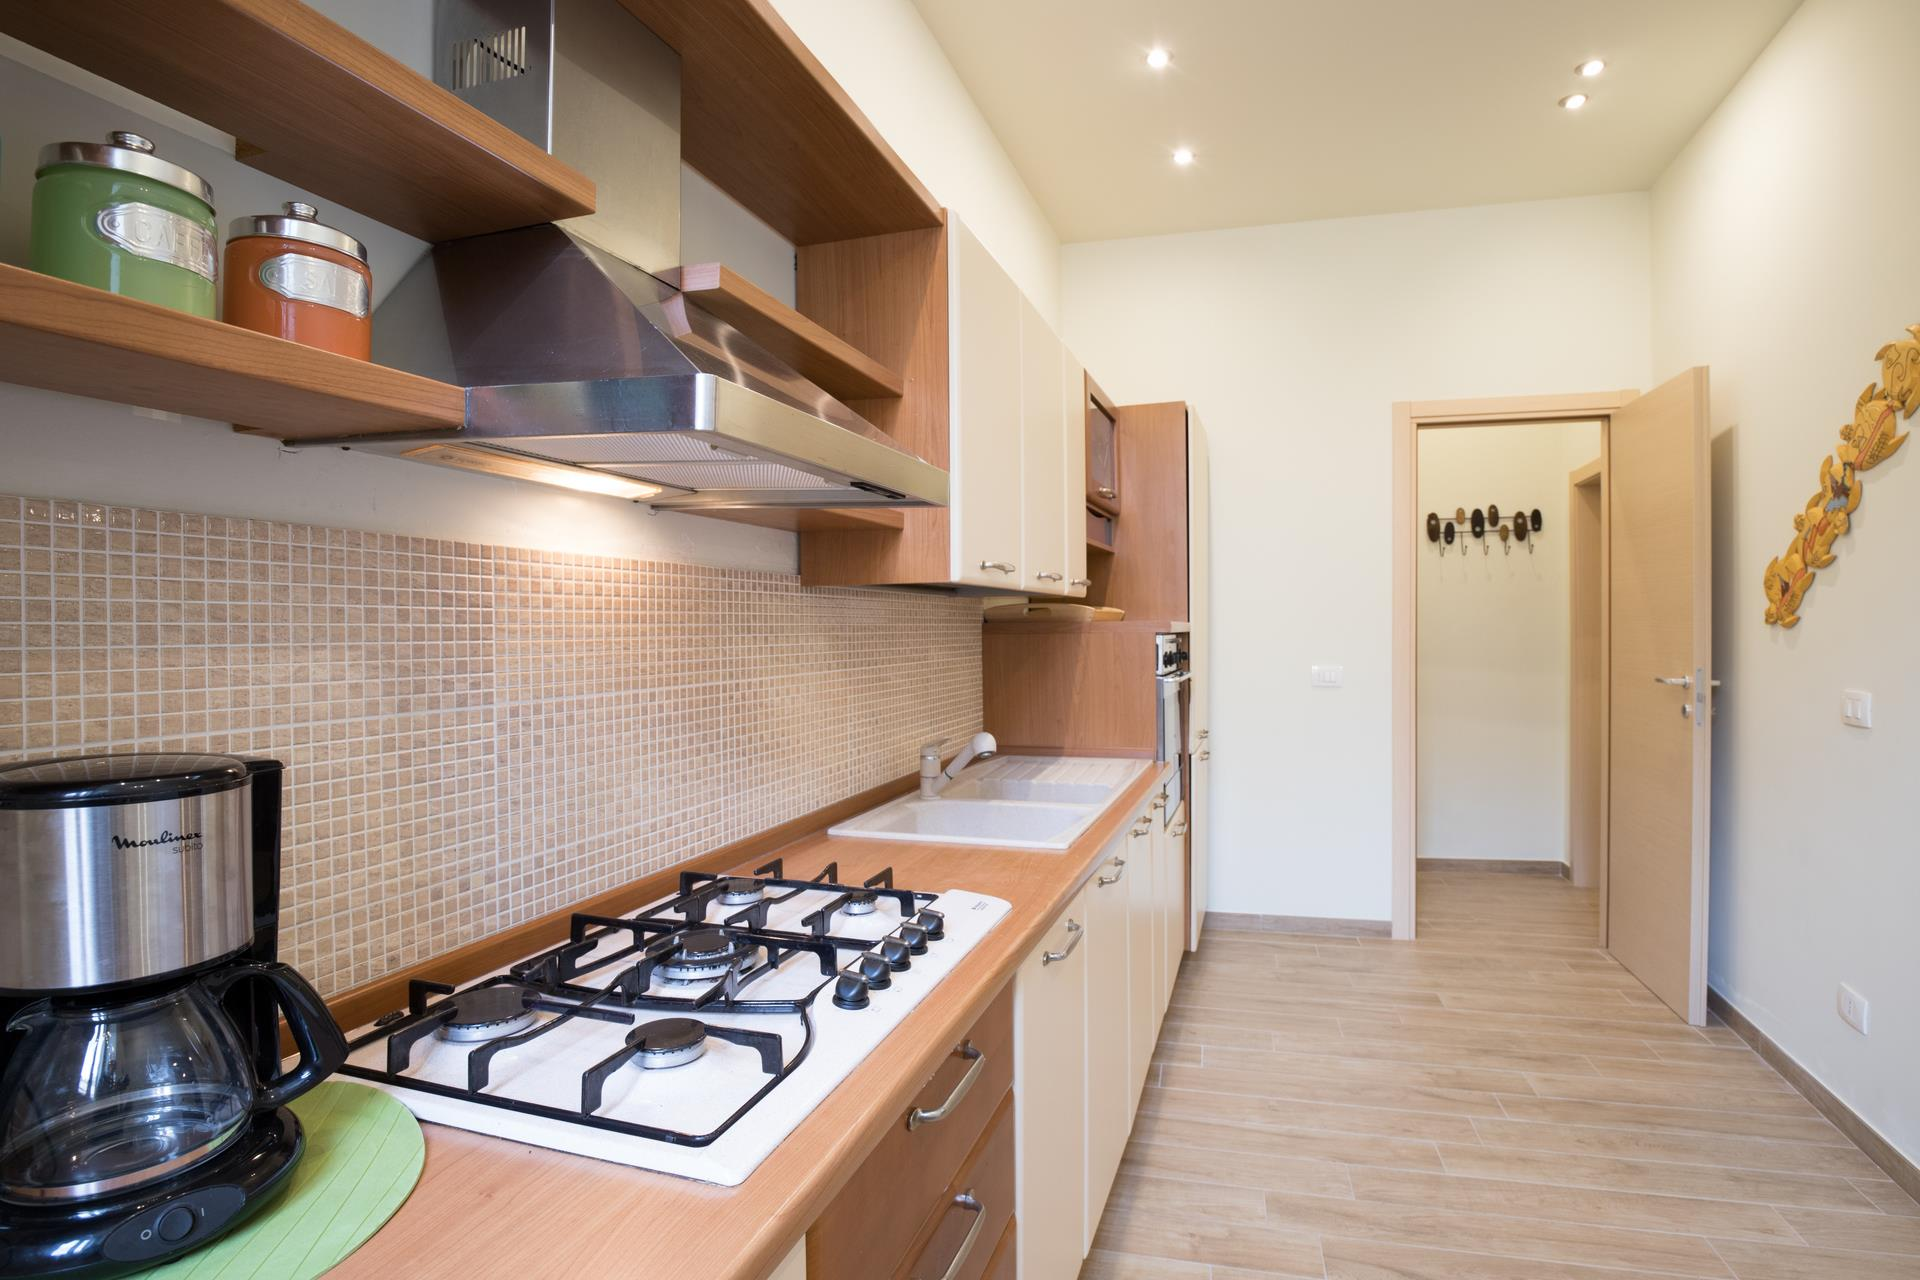 Apartment Hiresicily - Apt C - Wellness House Galilei photo 20375308